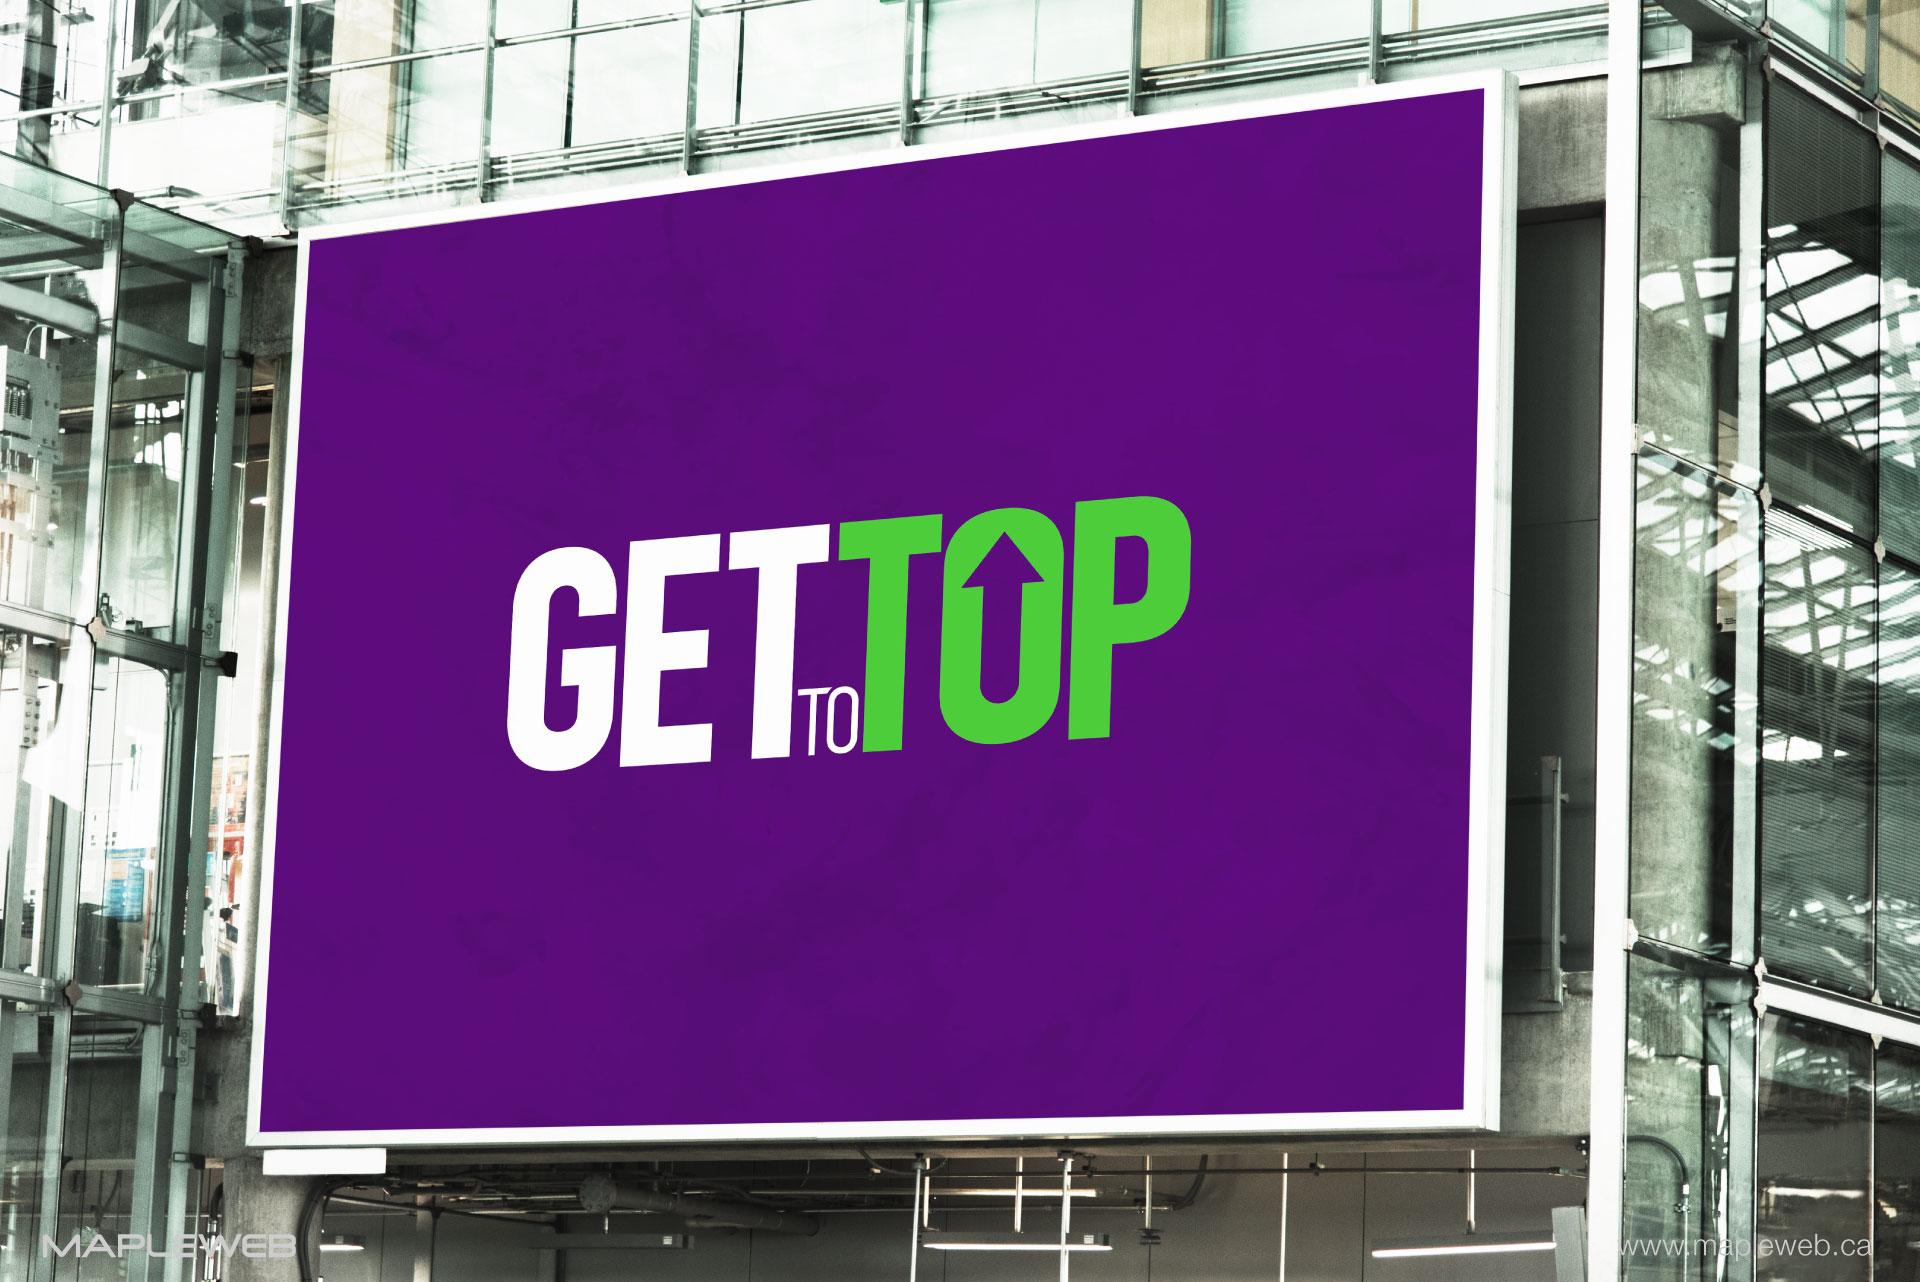 gettotop-brand-logo-design-by-mapleweb-vancouver-canada-billboard-mock